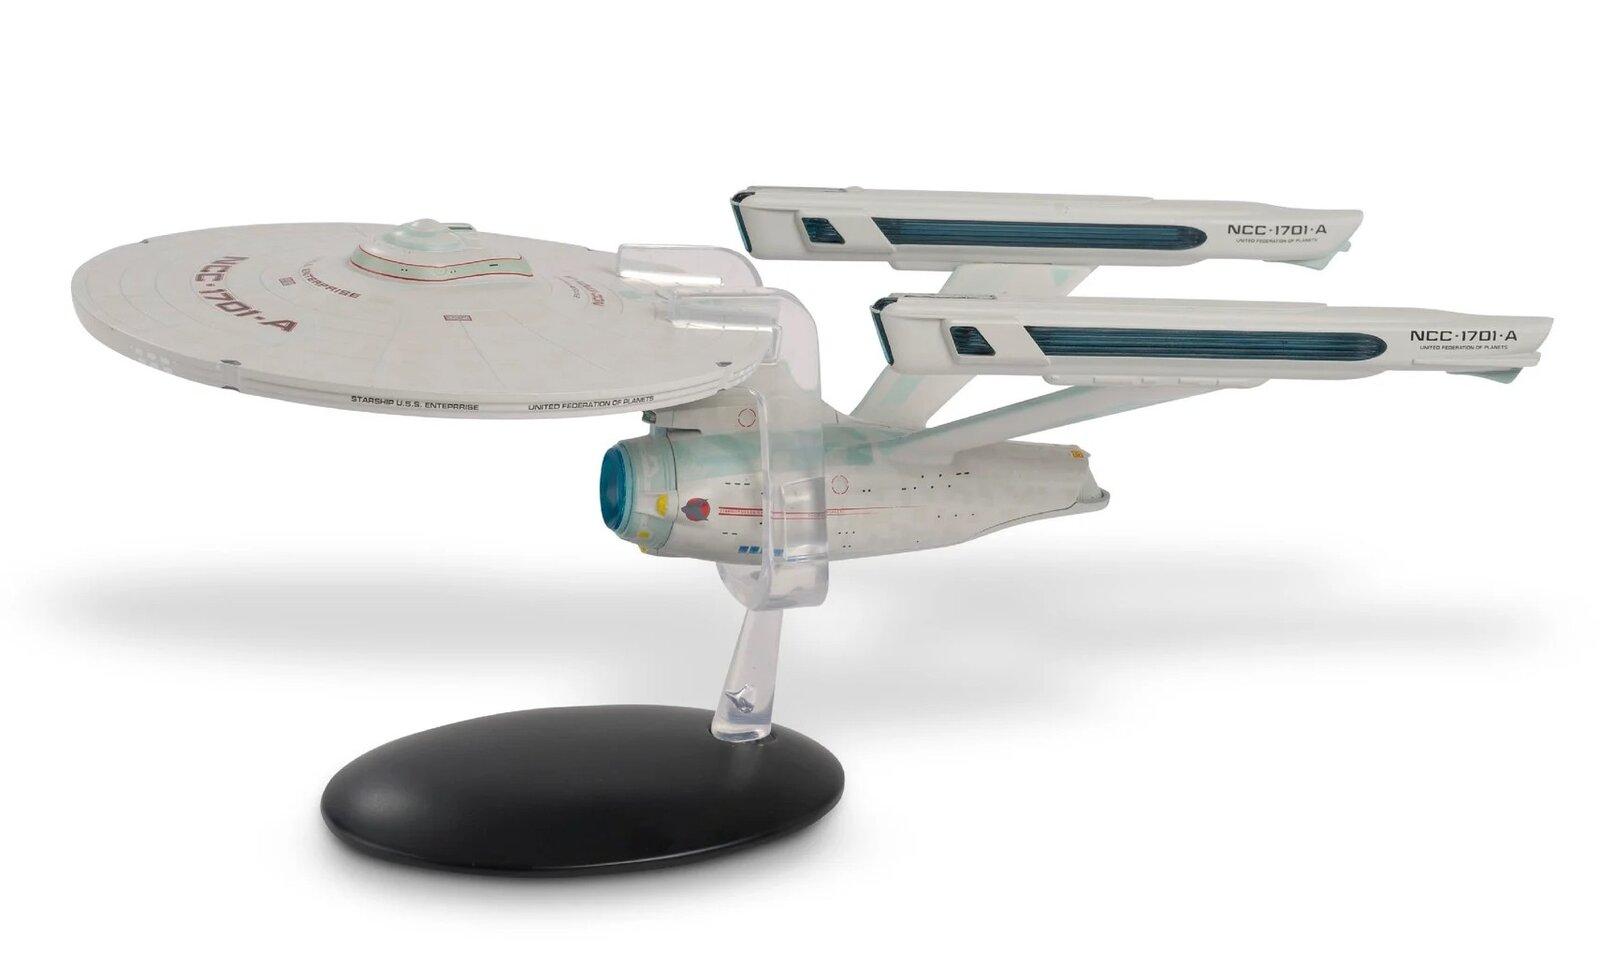 Enterprise A 3.jpg